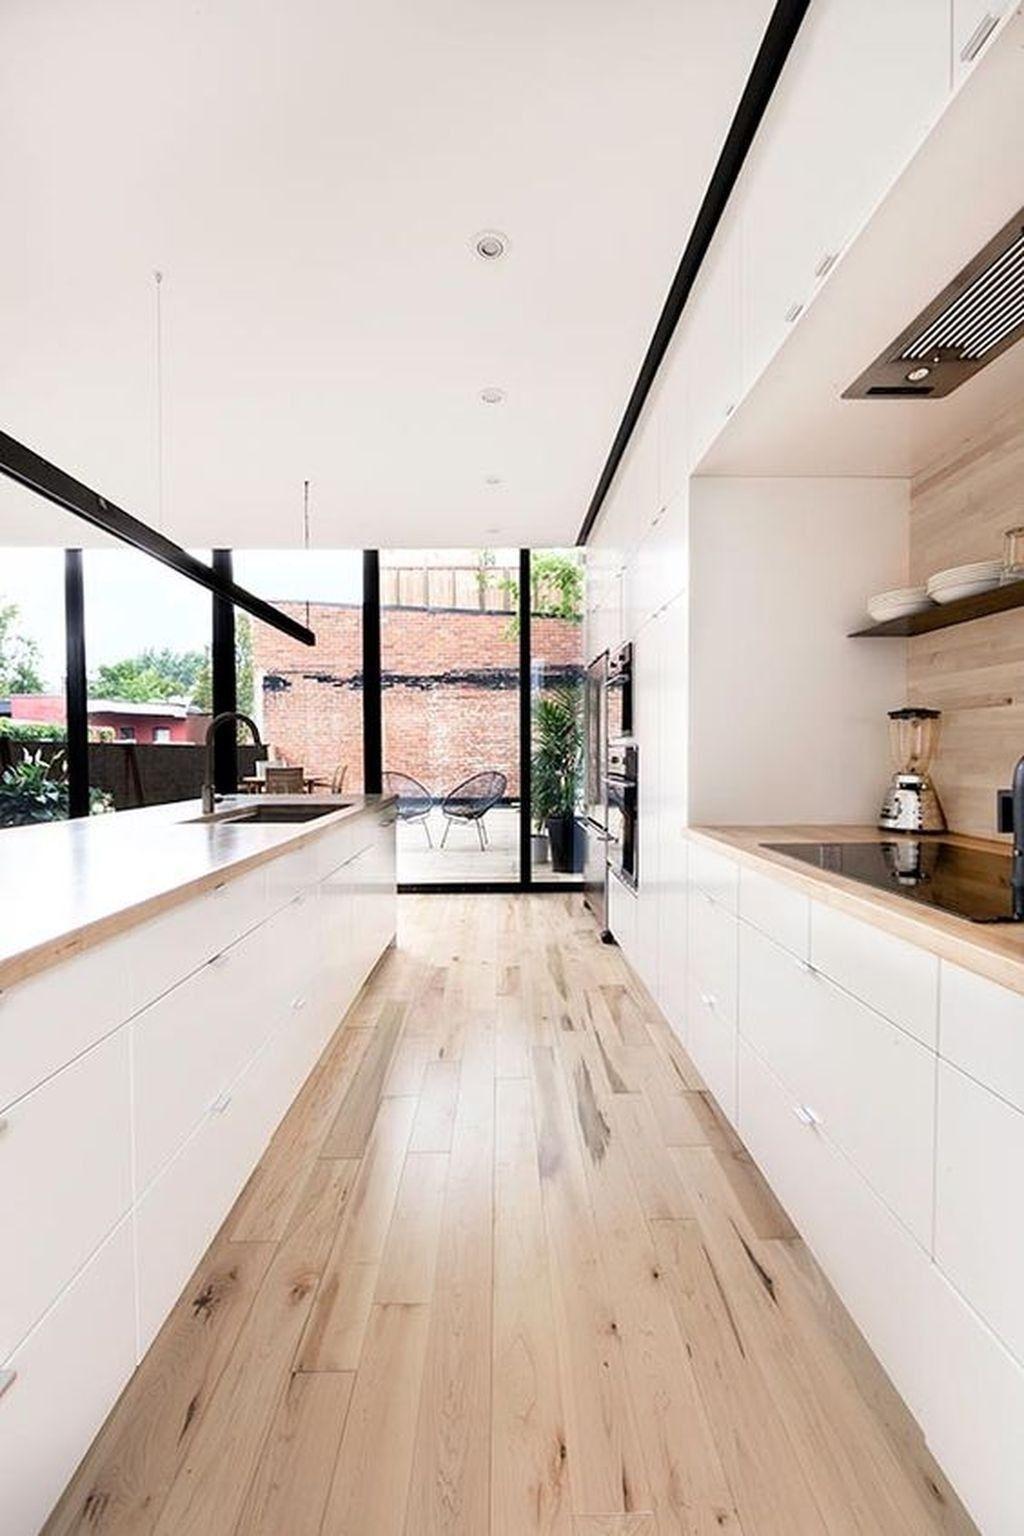 30 Awesome Black And White Wood Kitchen Design Ideas Kuche In 2020 Kuchen Design Design Fur Zuhause Kuche Holz